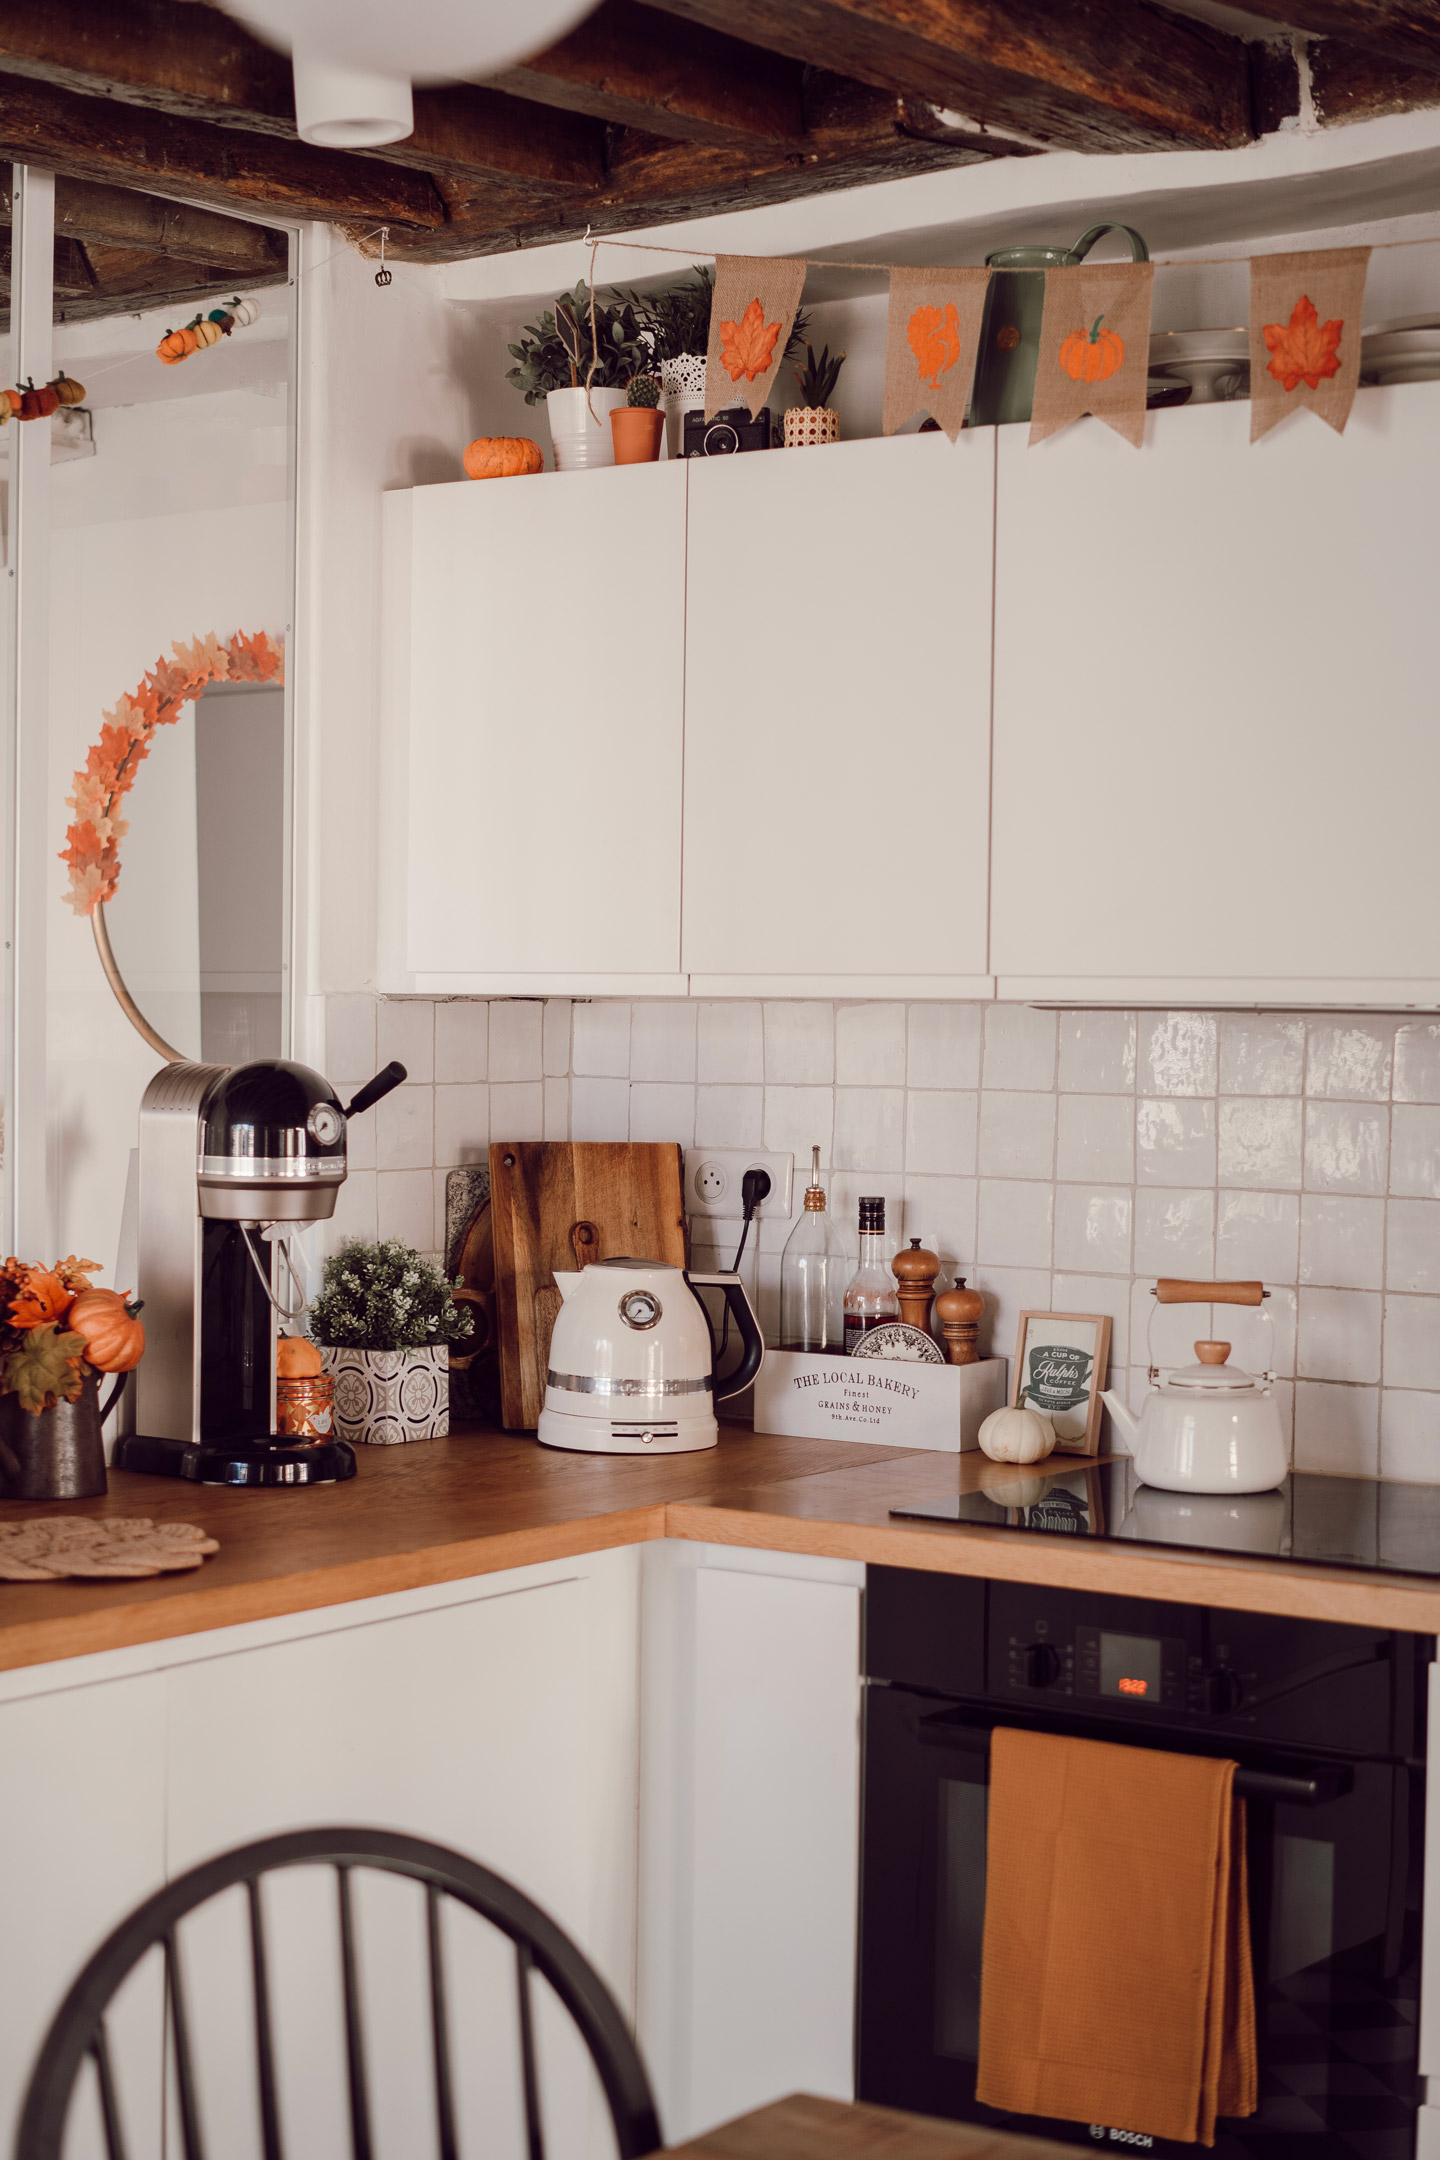 decoration-automne-03721